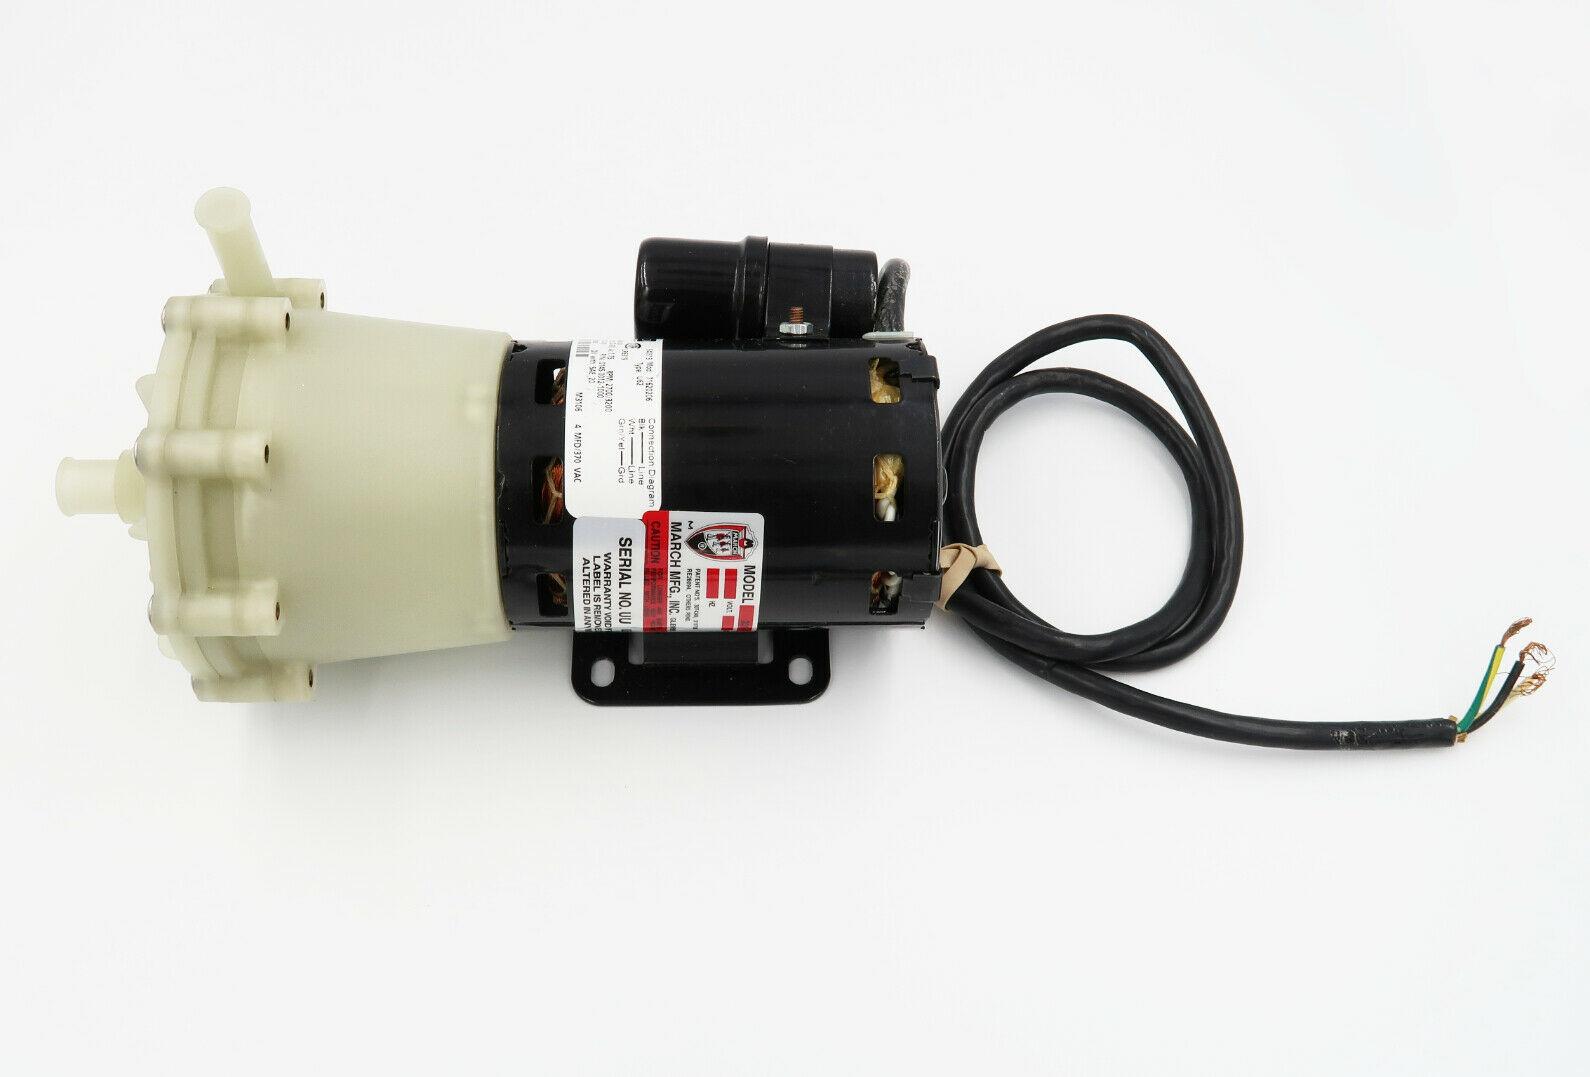 March Pumps Series 320